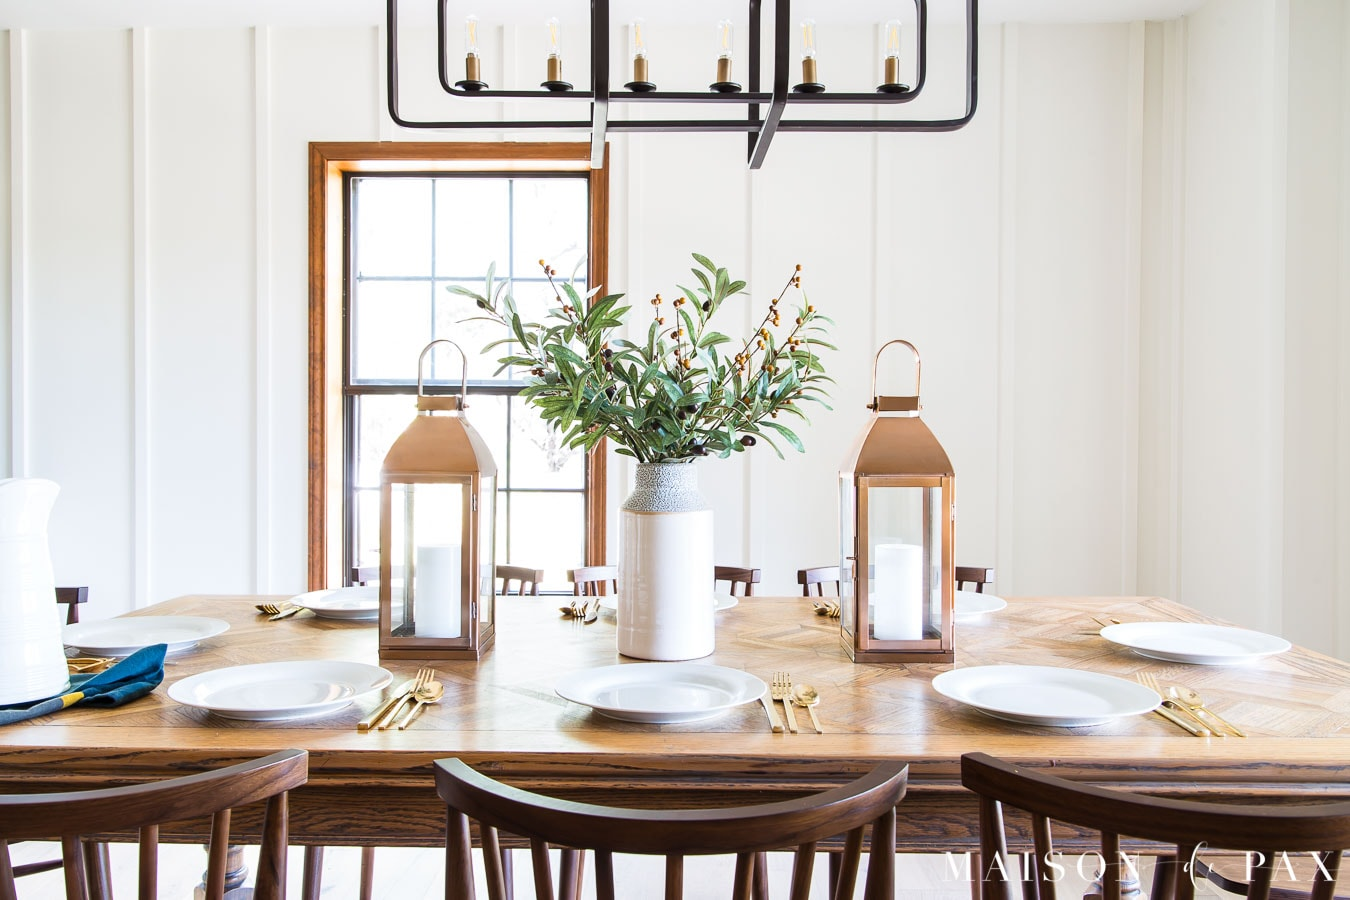 Simple Farmhouse Fall Table Maison De Pax